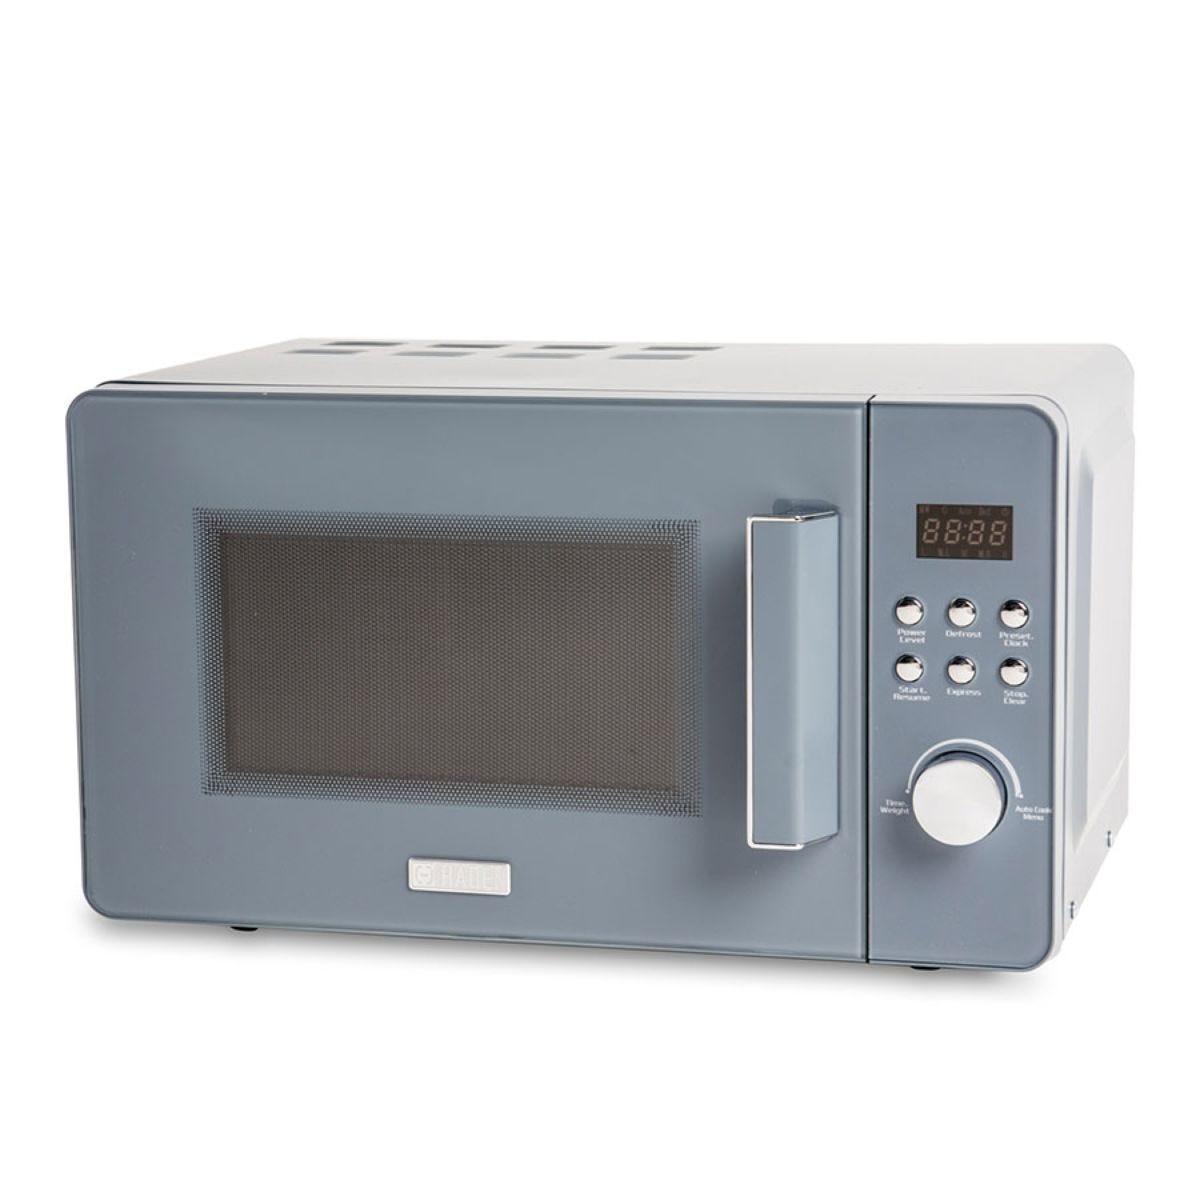 Haden Perth Sleek 800W 20L Manual Microwave - Slate Grey